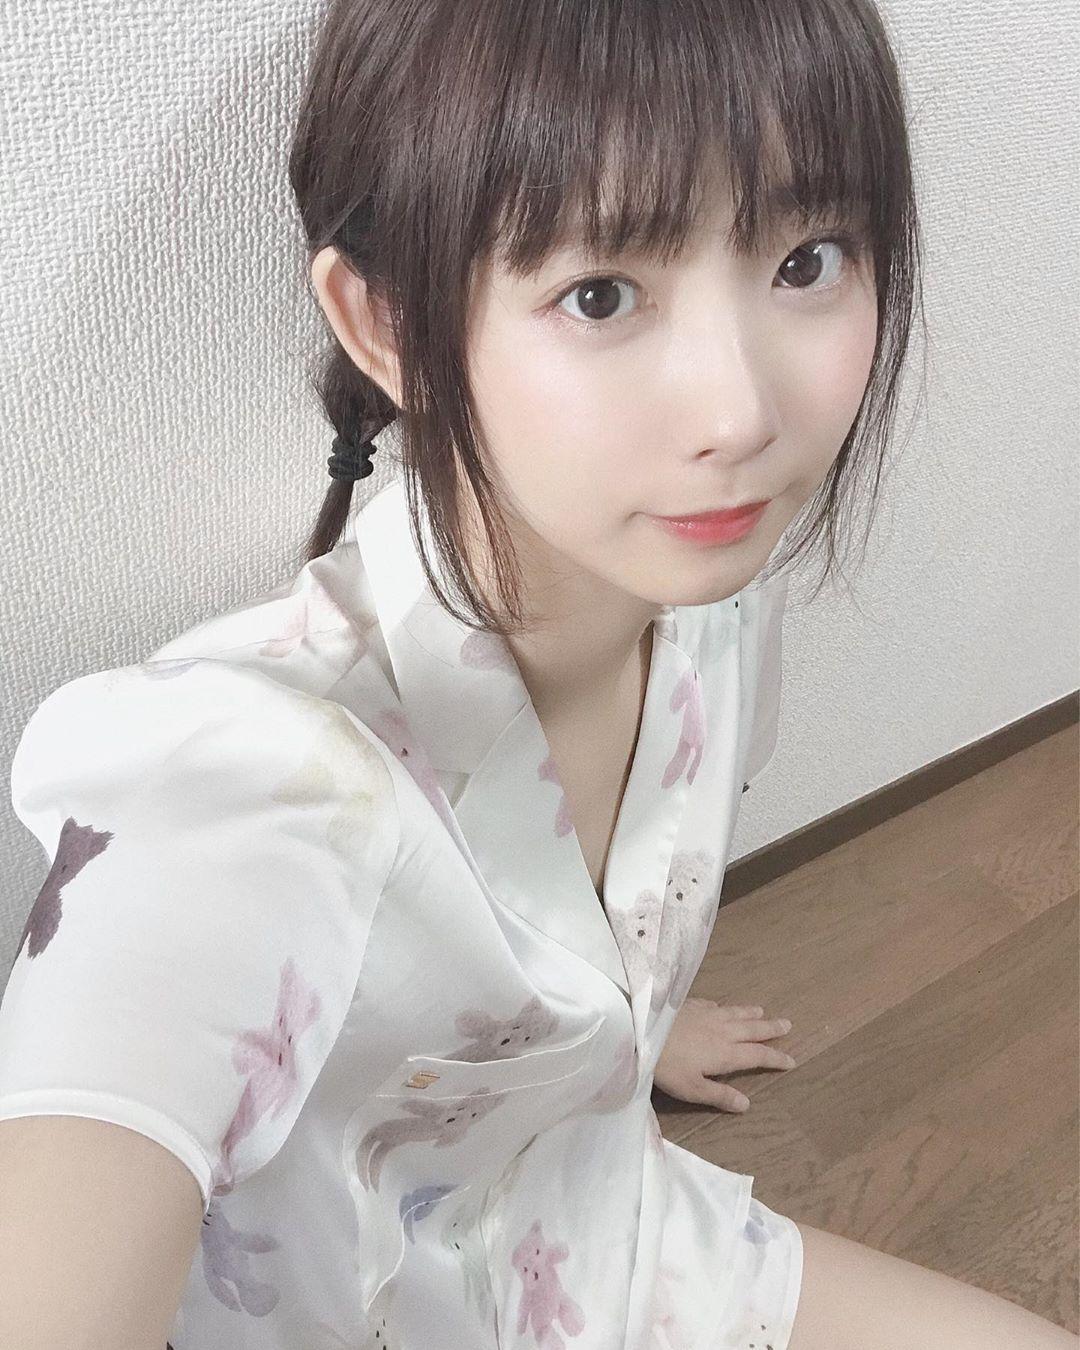 jUny92T6 o - IG正妹—水湊みお Mio Minato